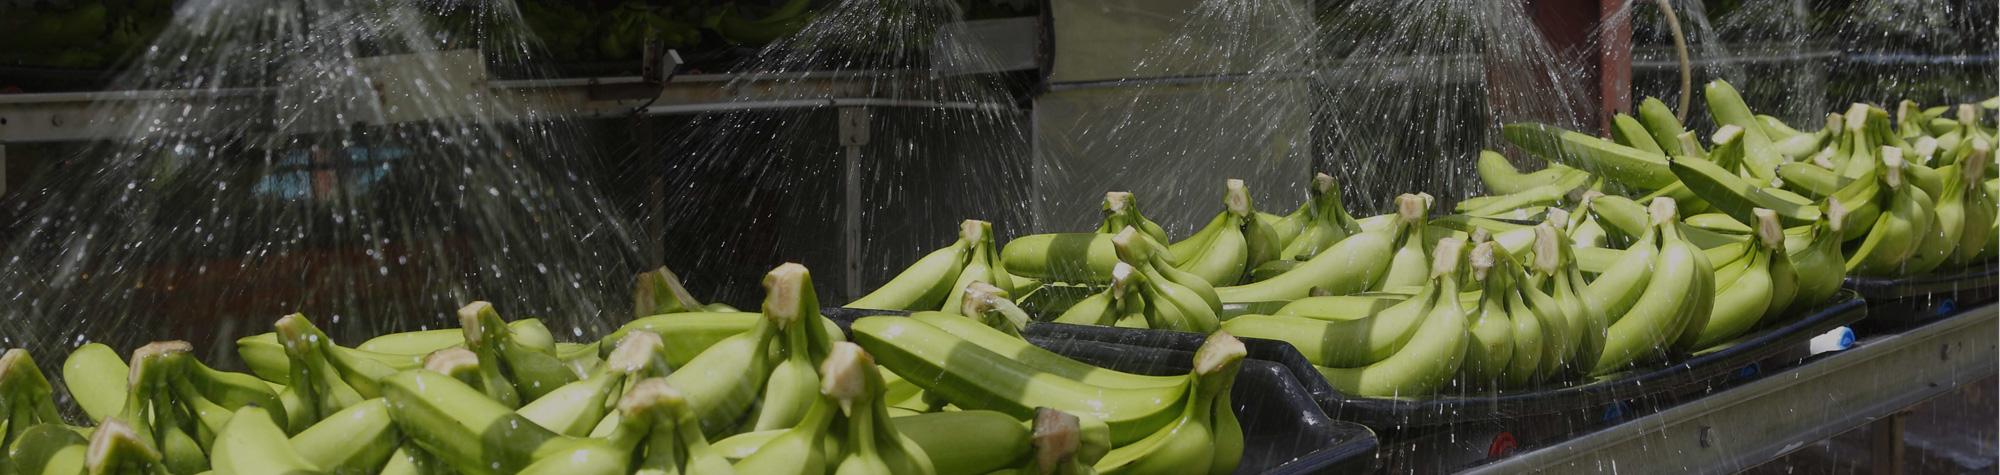 industries-food-produce